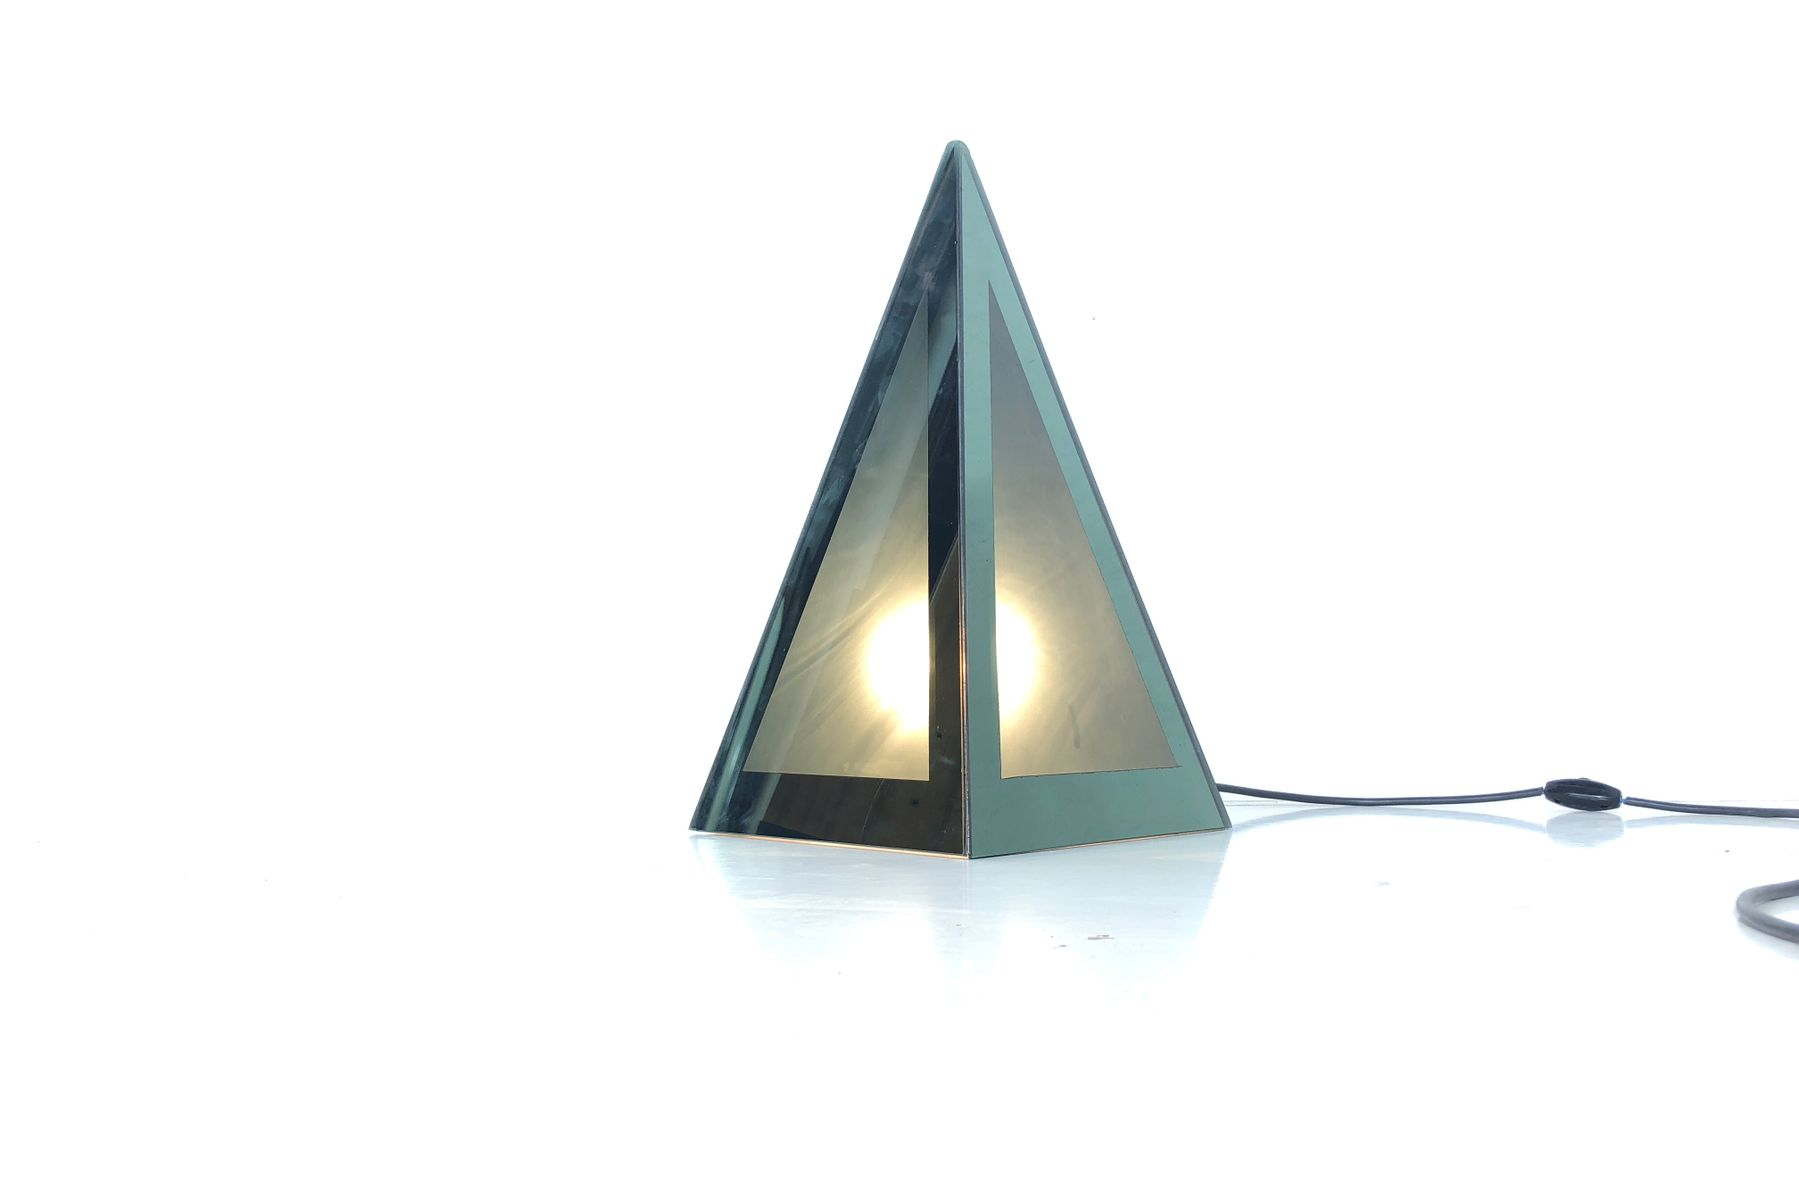 Cronotopo Tischlampe von Nanda Vigo, 1960er